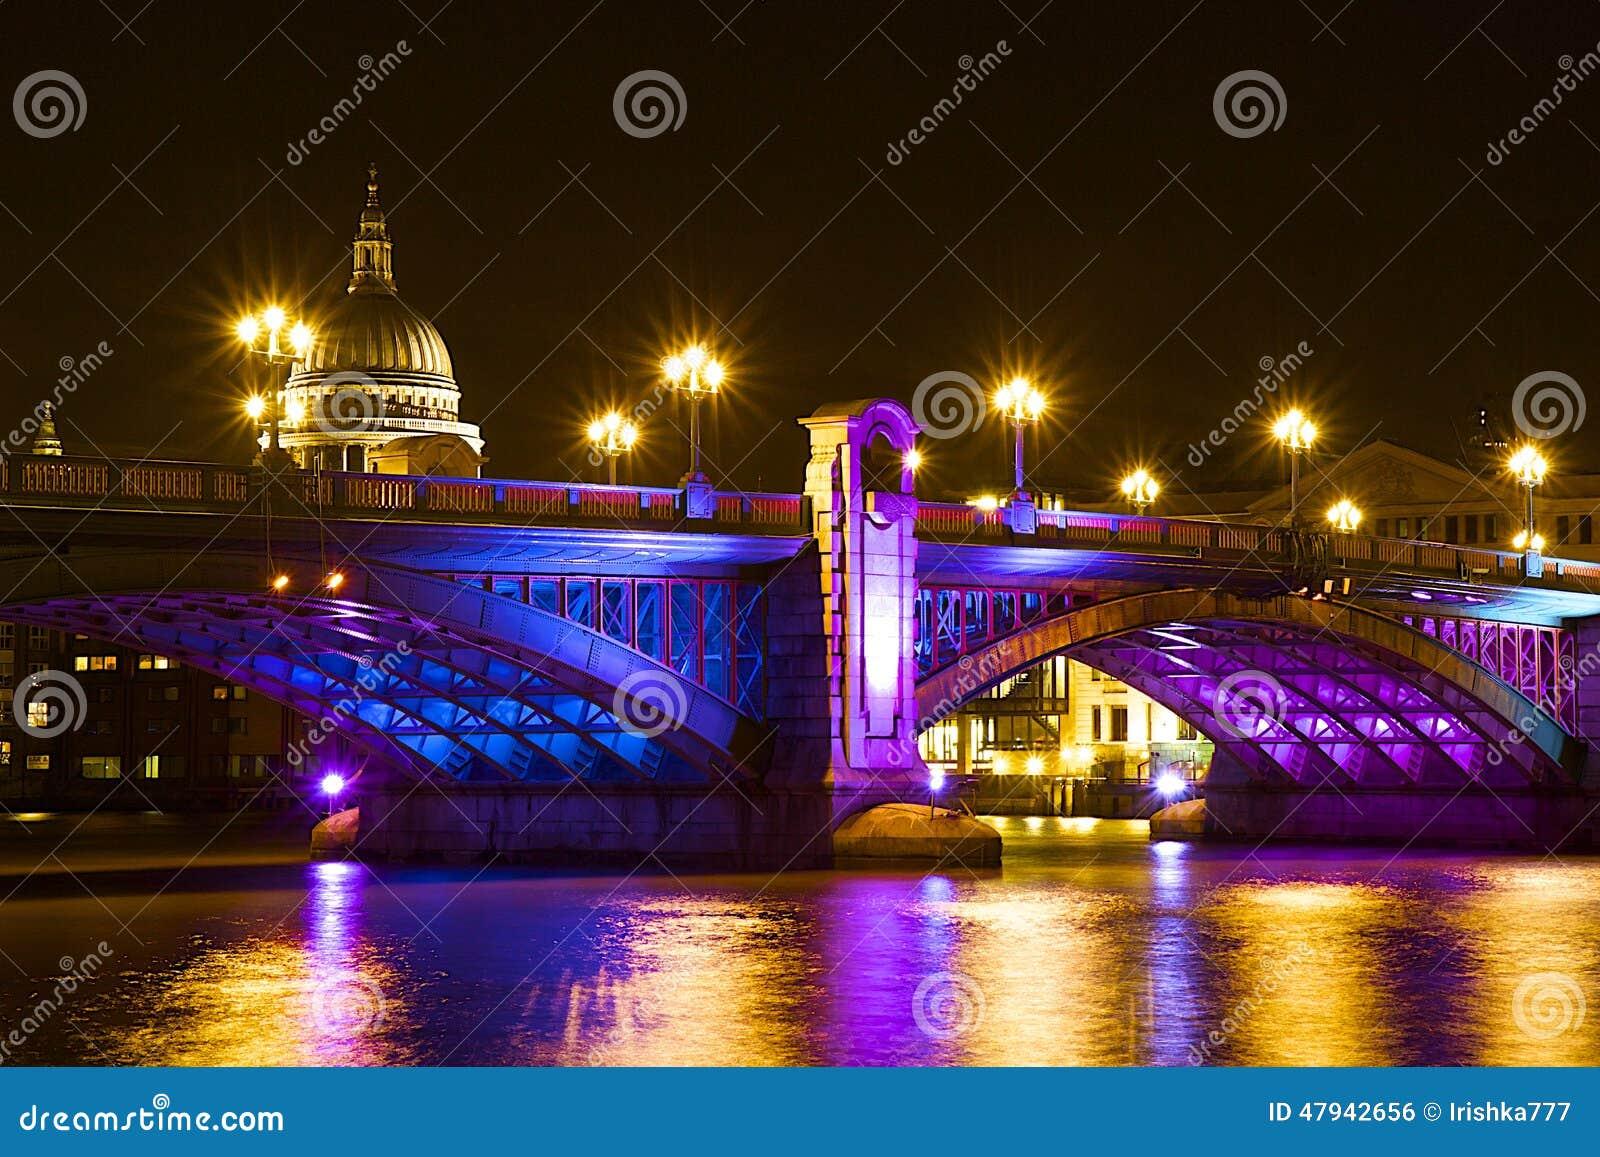 london bridge christmas engineering